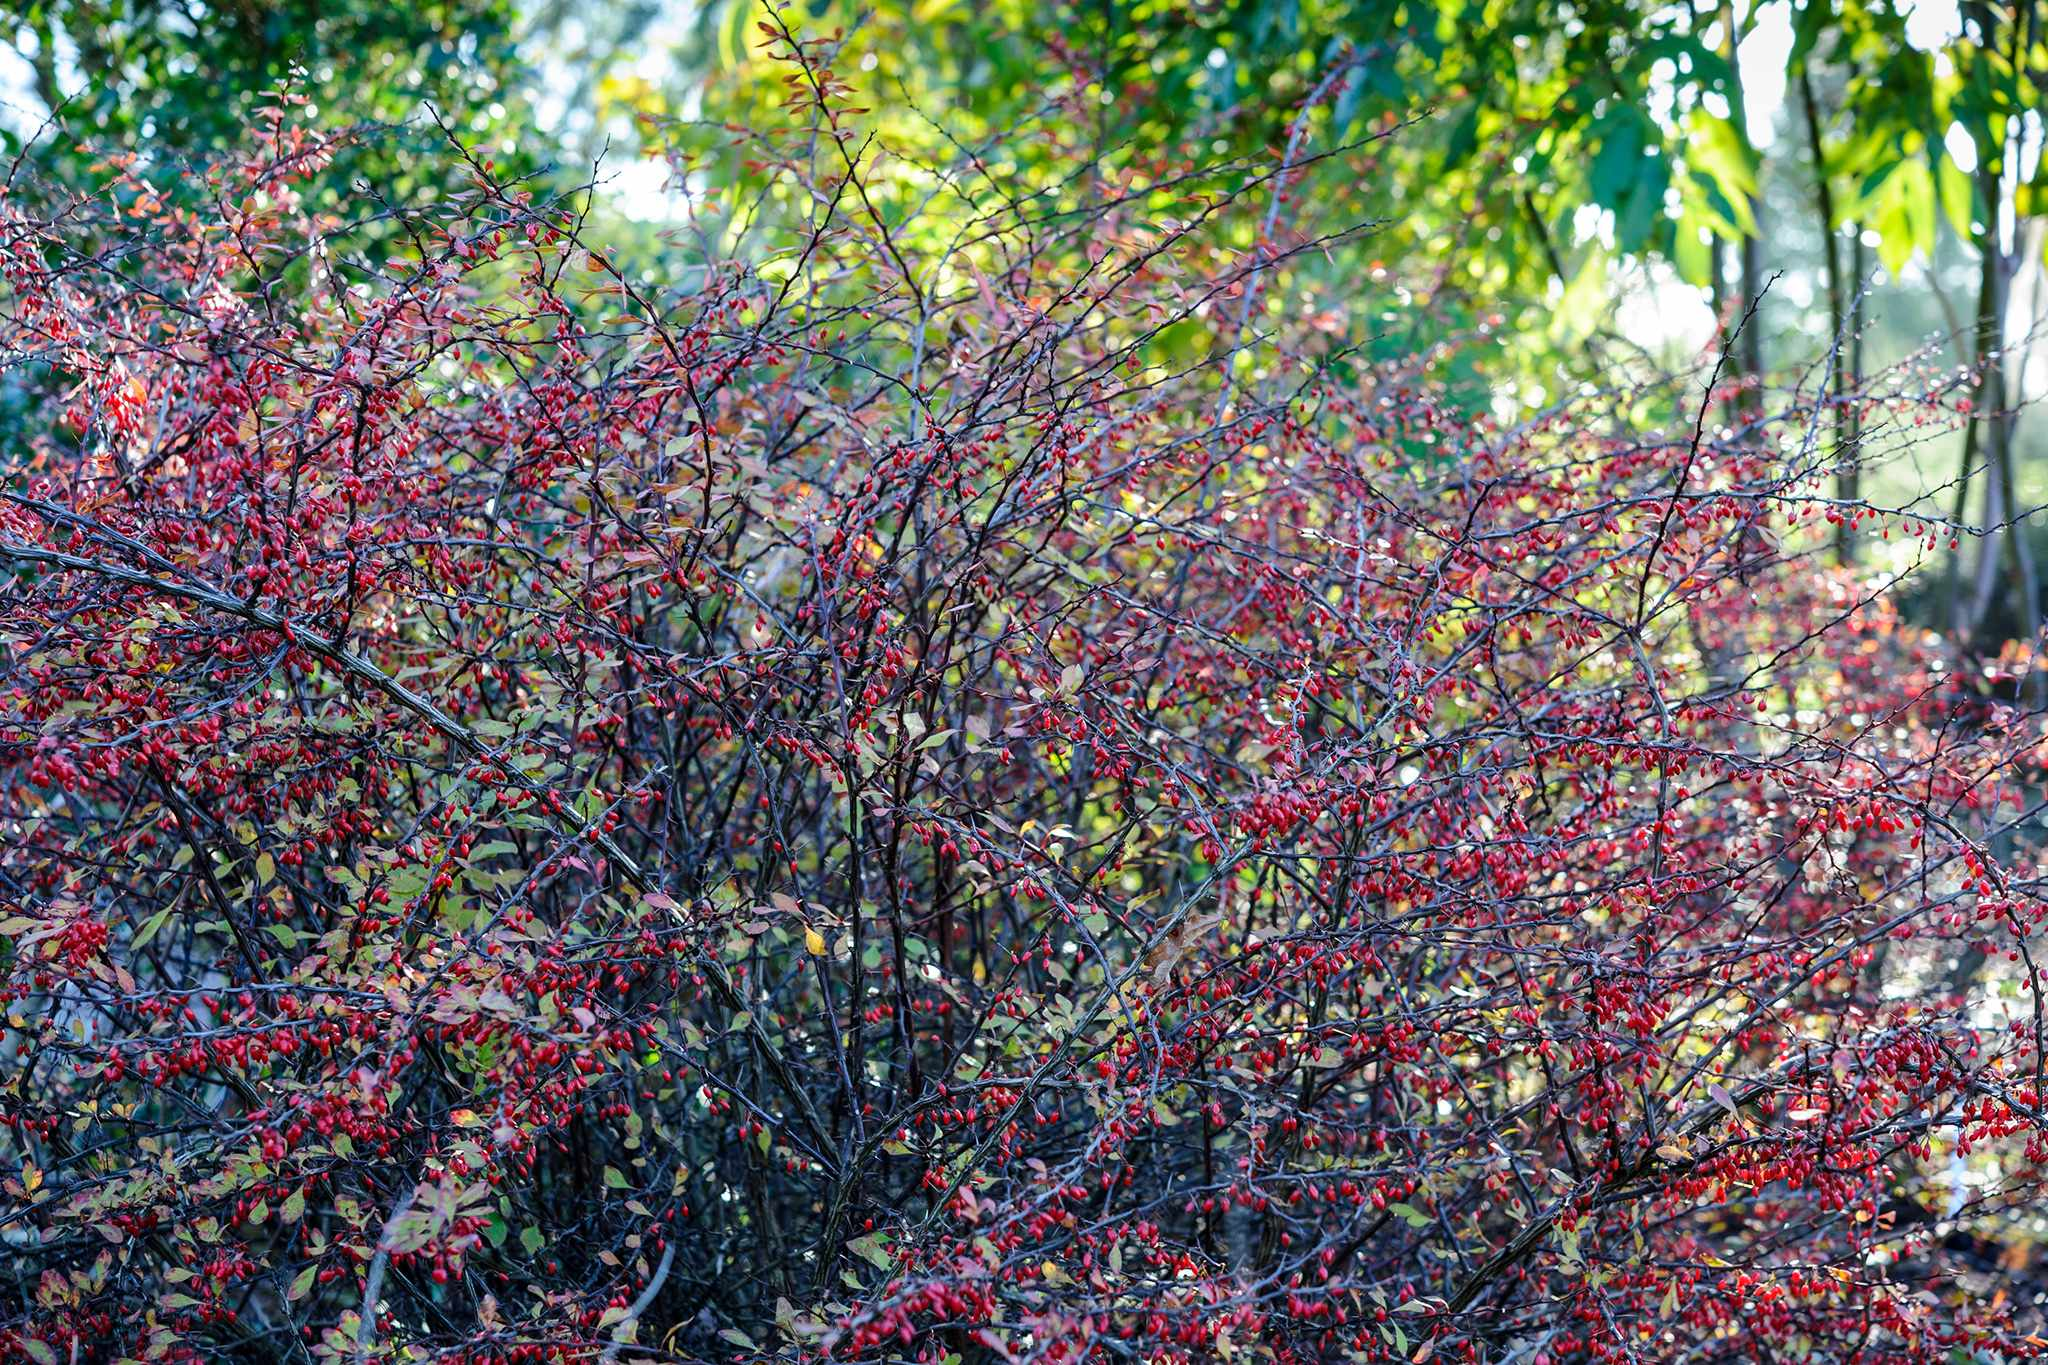 Berberis thunbergii 'Cheal's Scarlet'